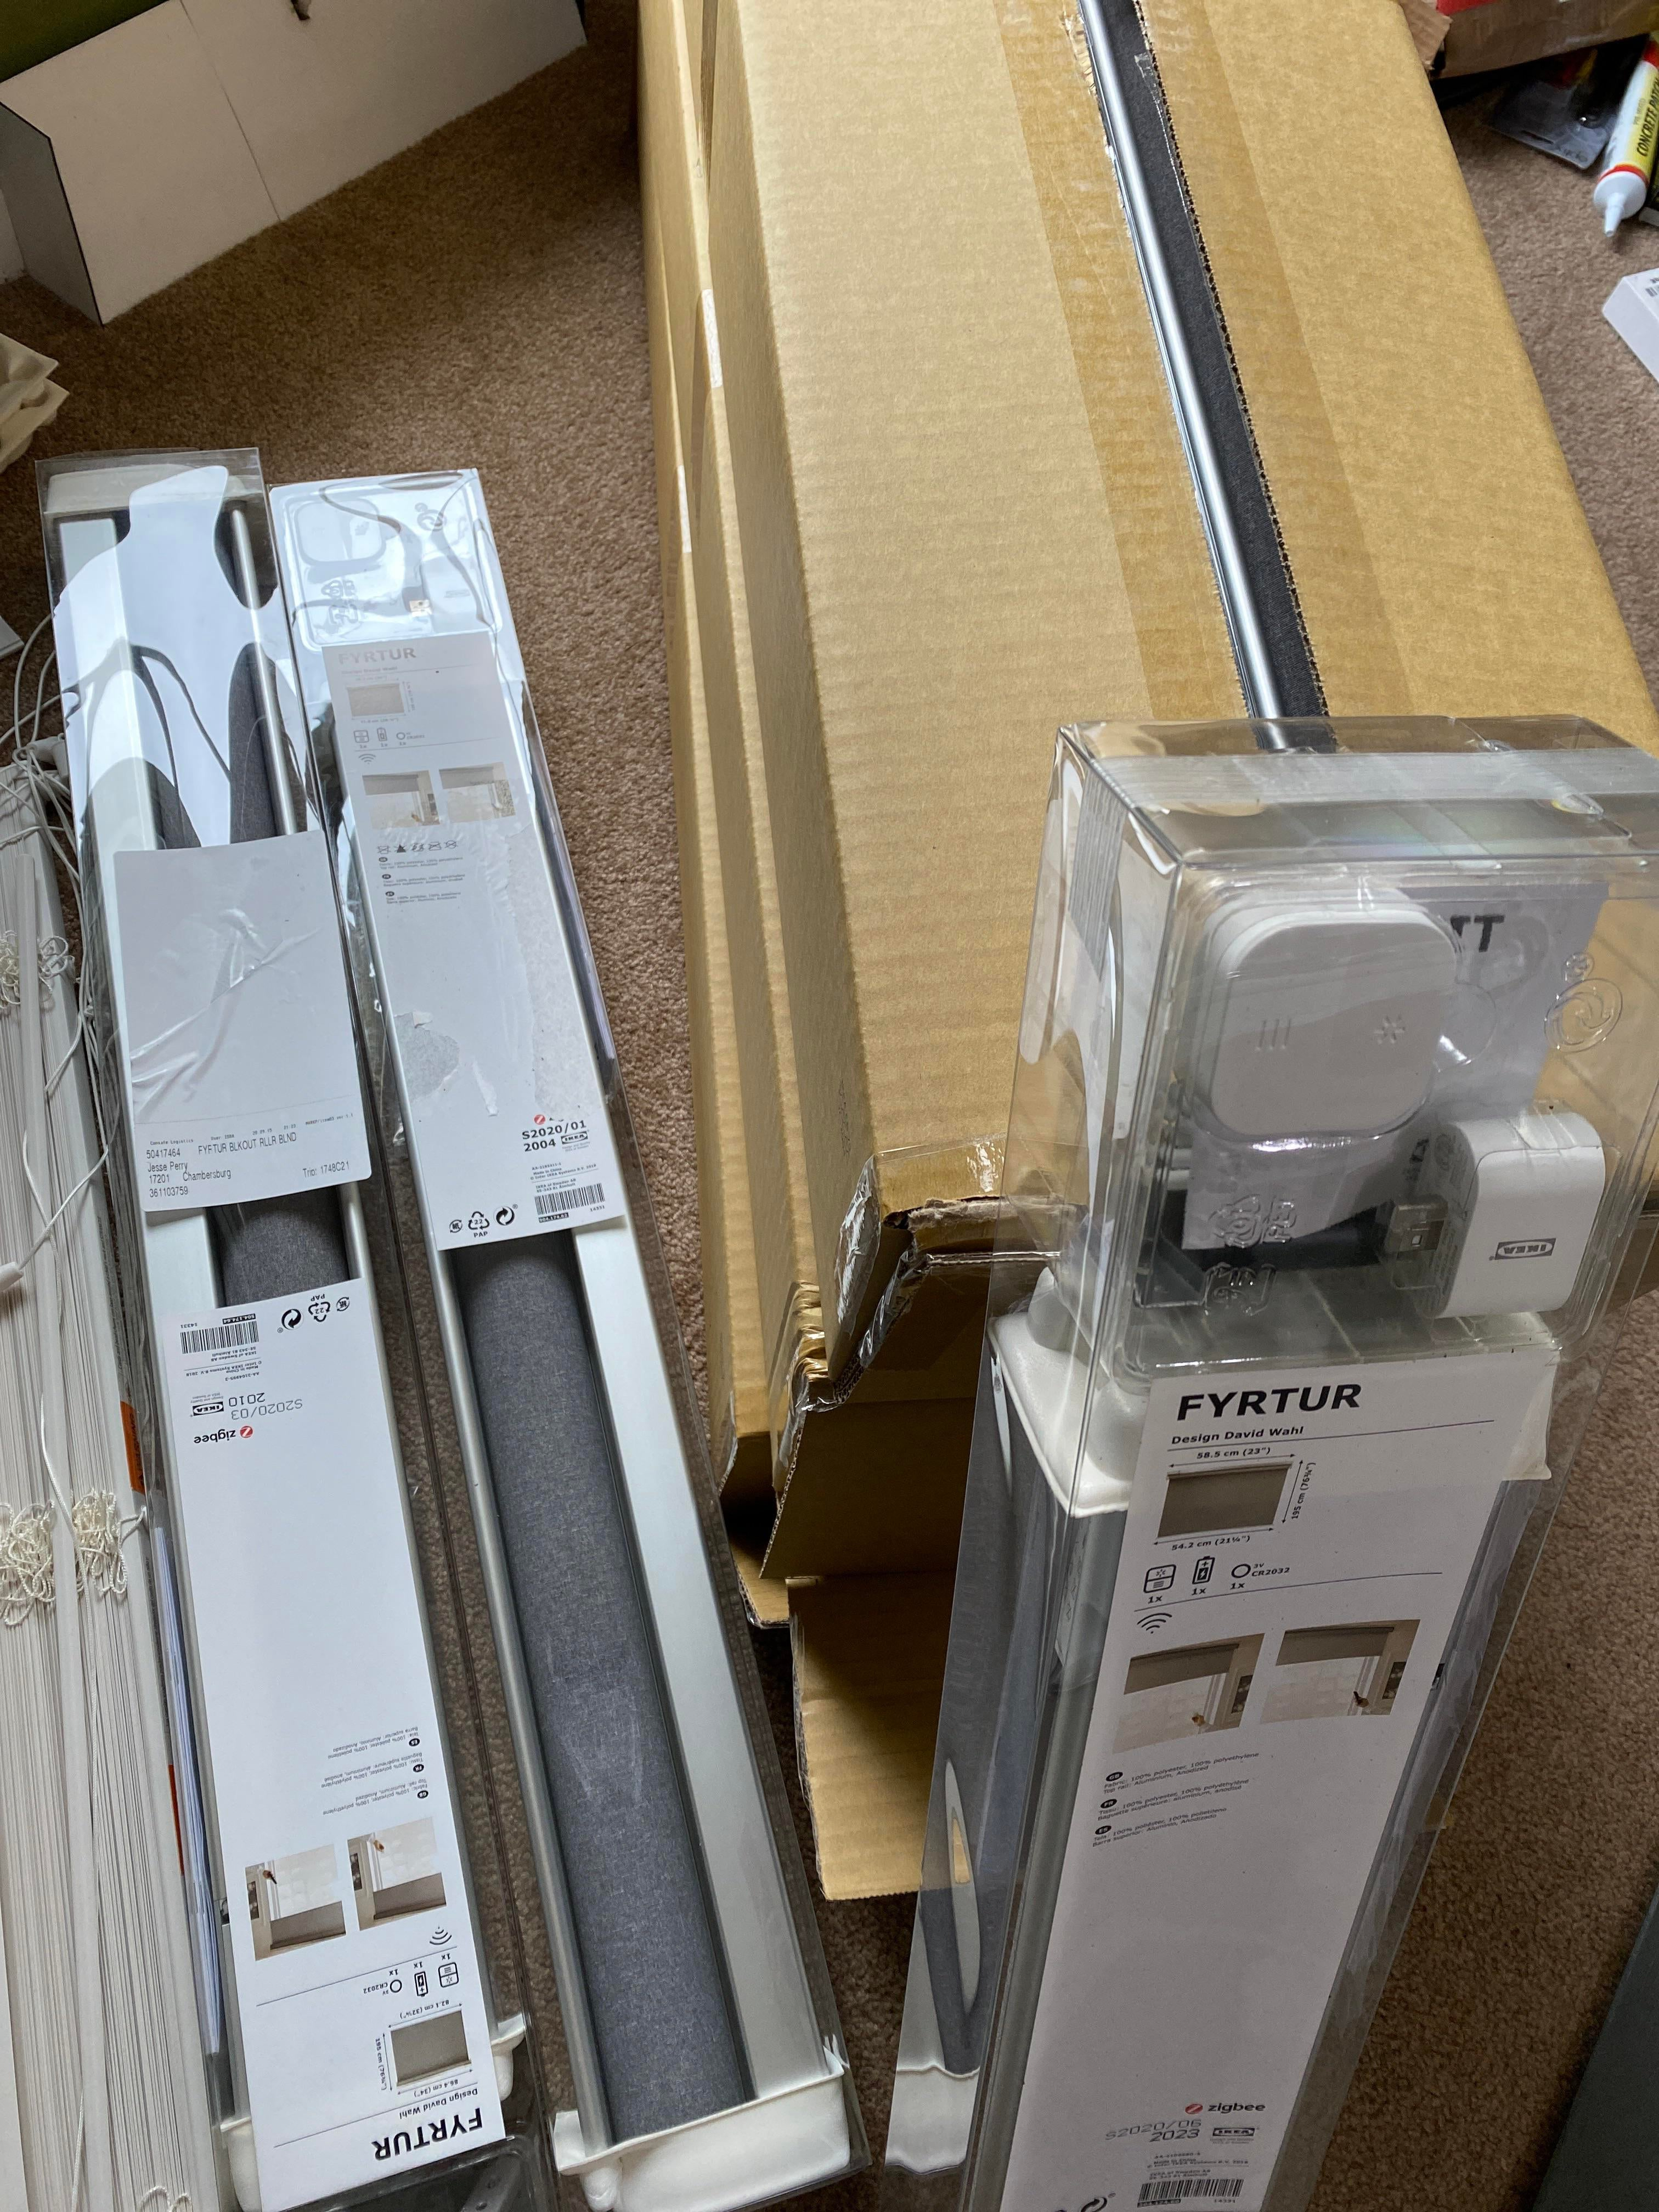 14 blinds IKEA Fyrtur to install